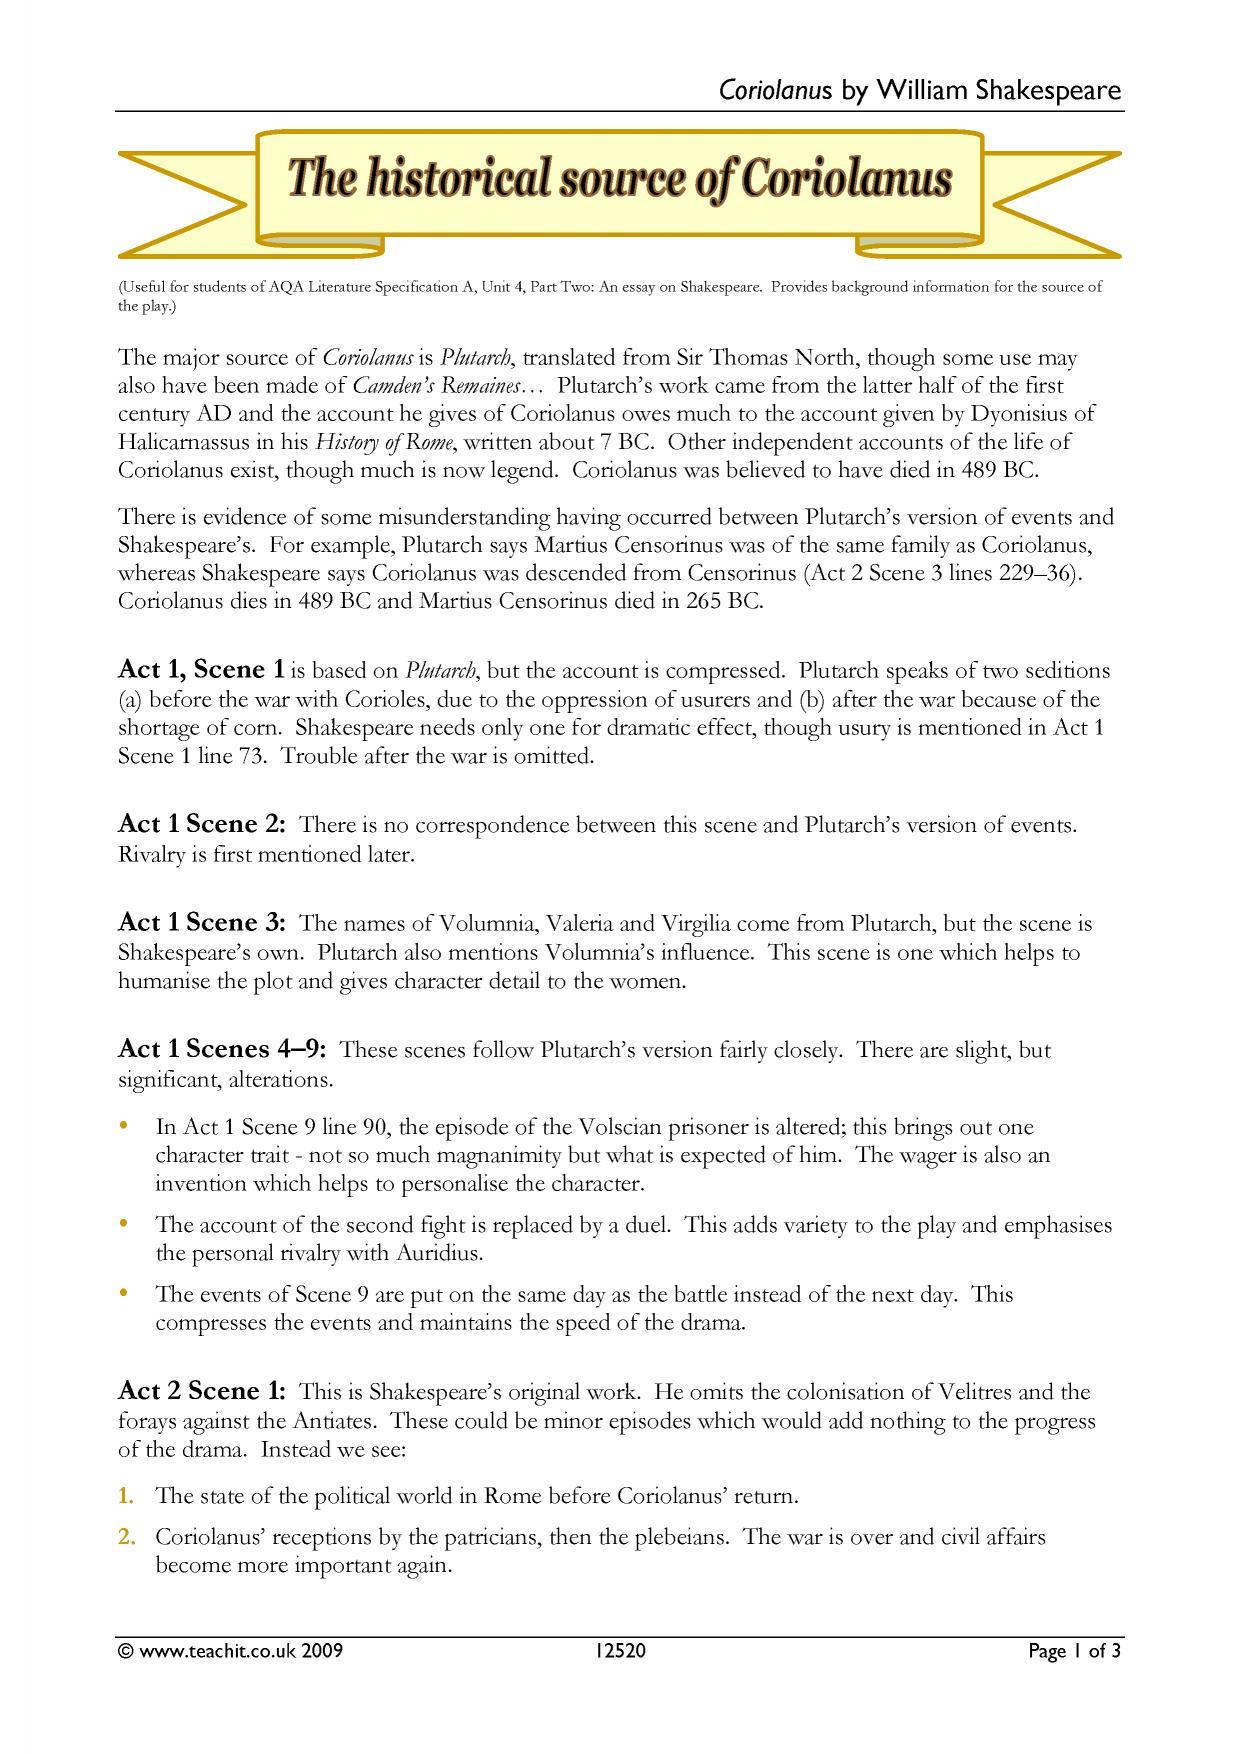 Mod h chapter 1 homework image 1